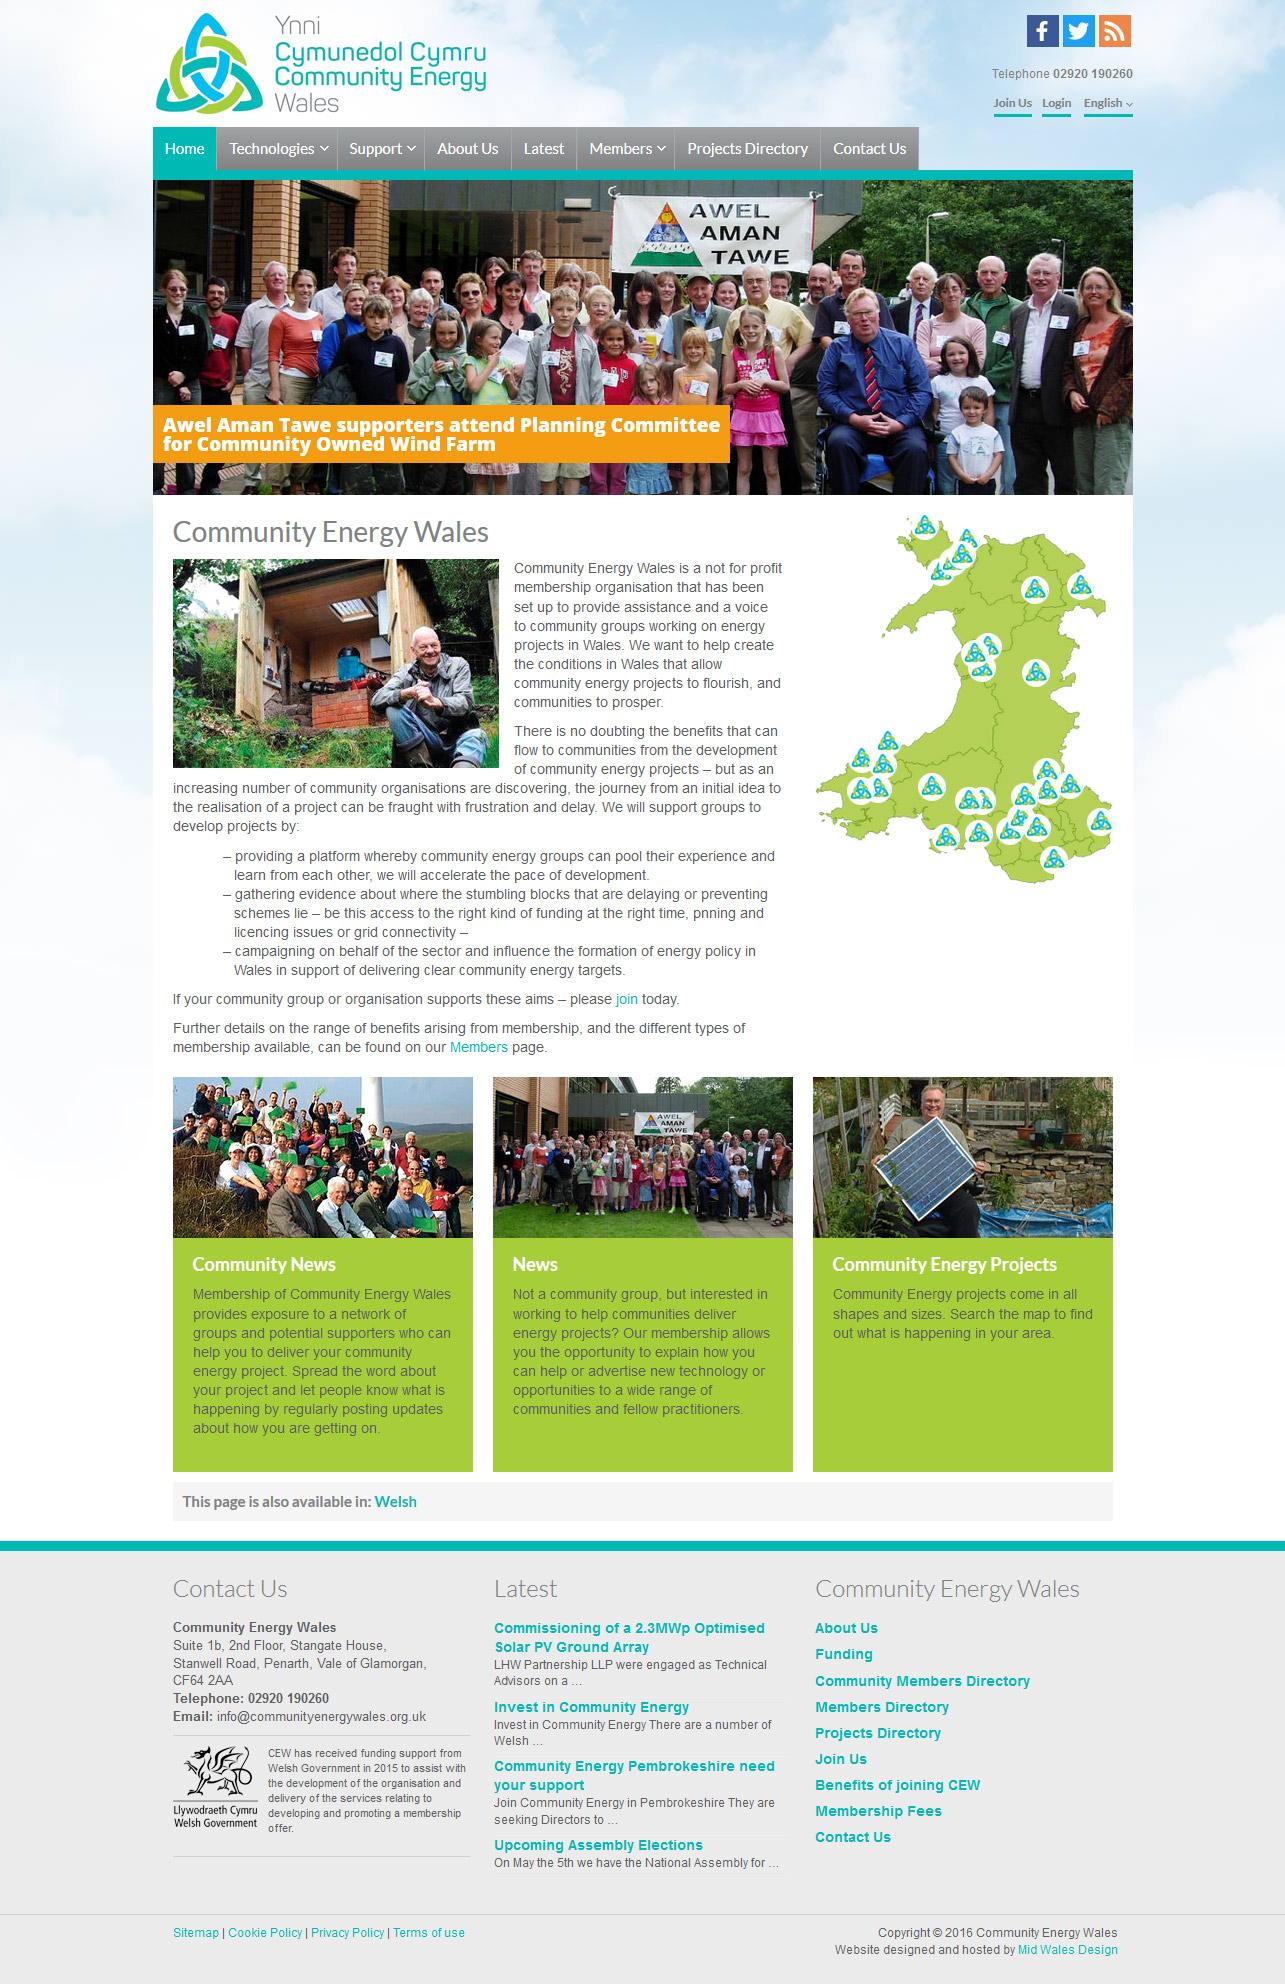 Community Energy Wales website